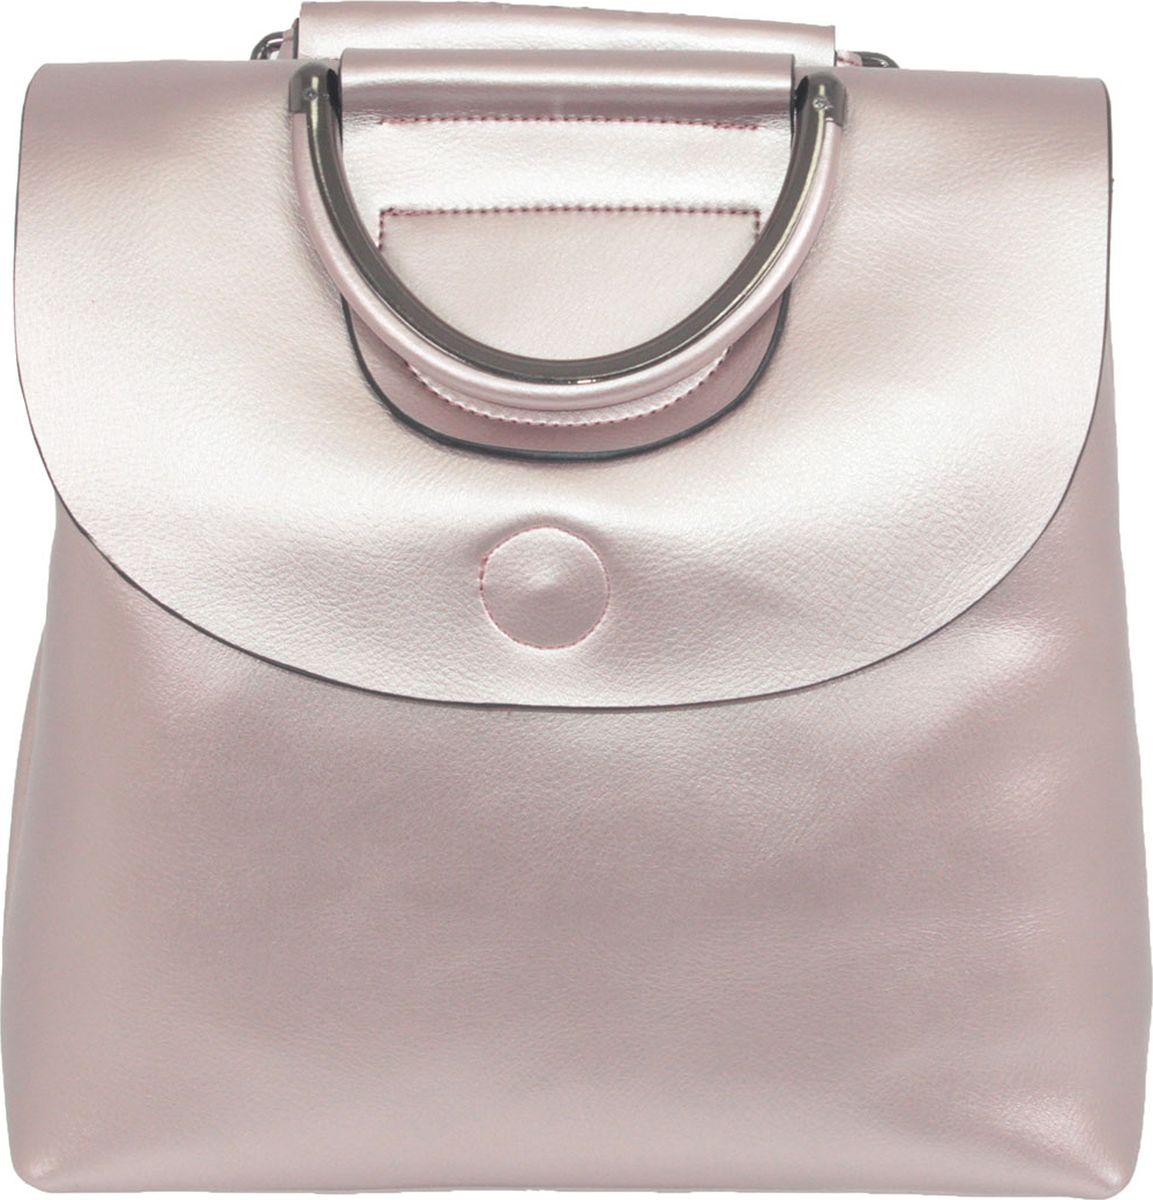 Рюкзак женский Flioraj, цвет: розовый. 2581-220 pink рюкзак flioraj flioraj fl976bwaxuo8